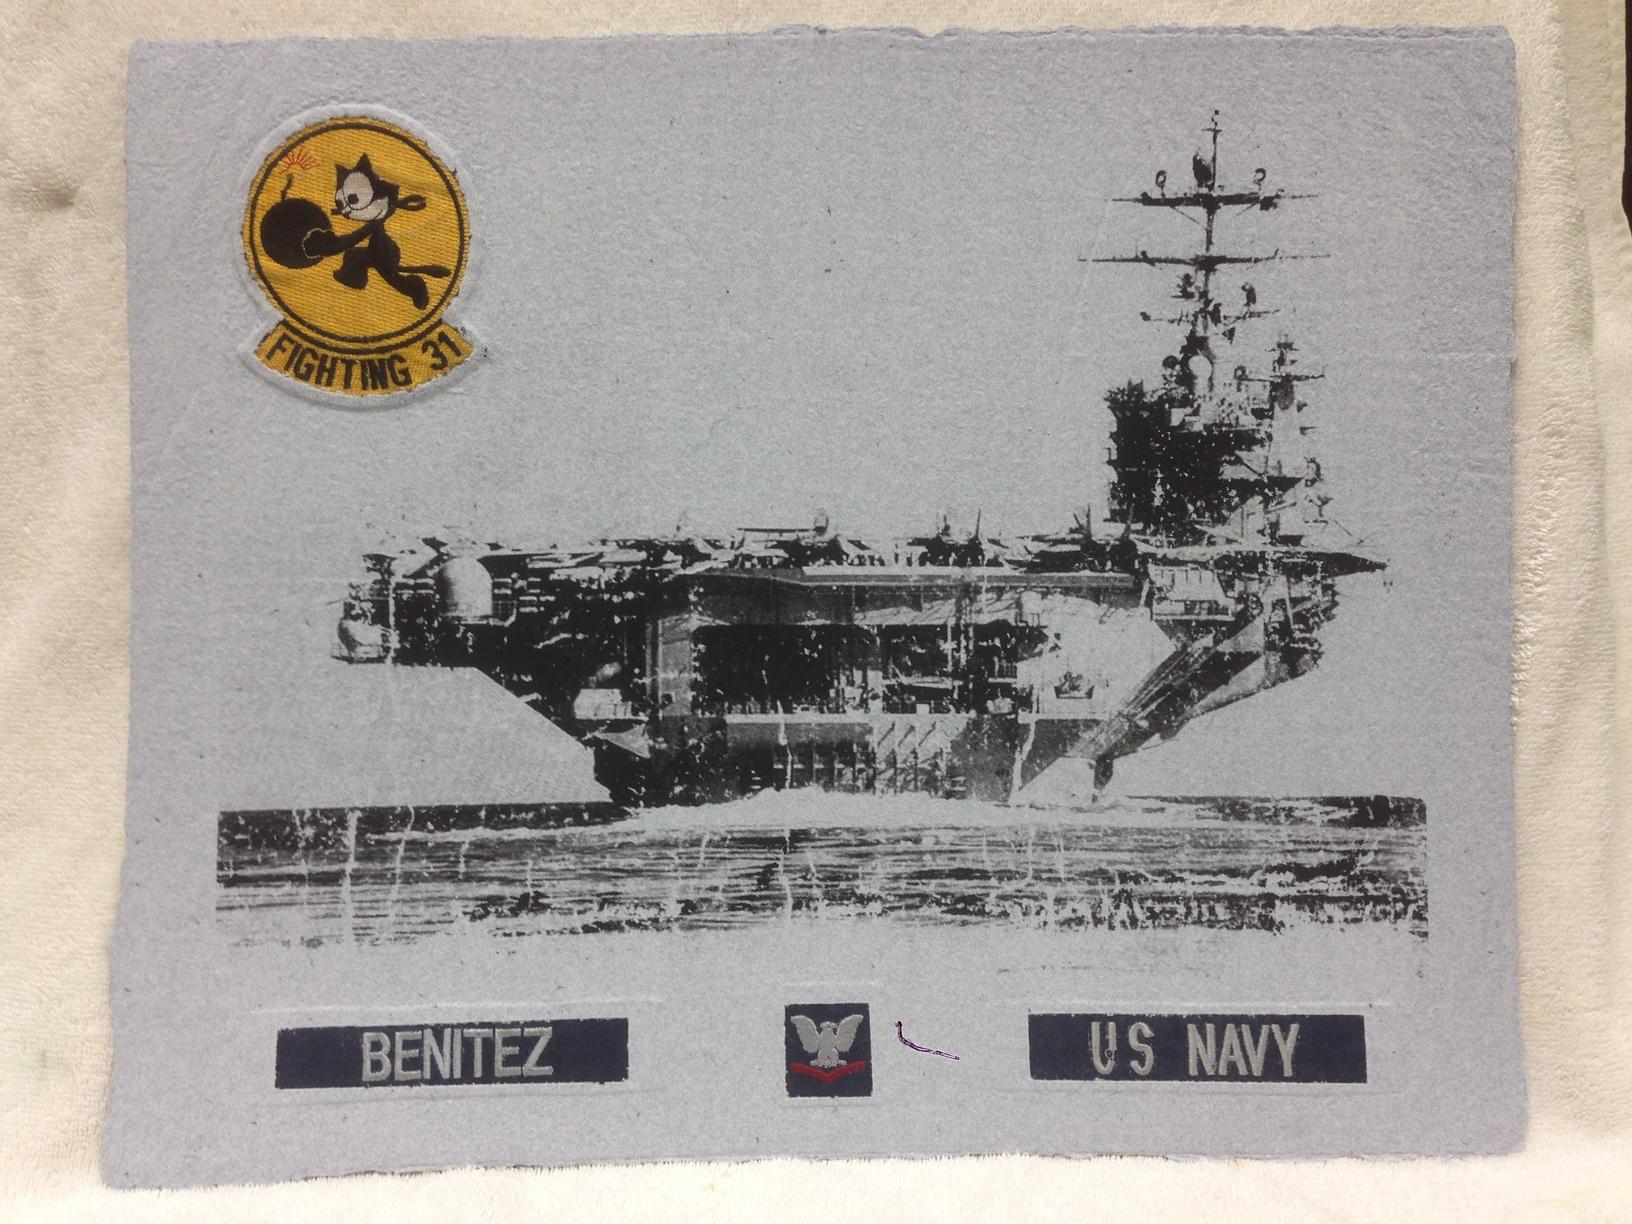 Beni Navy _Fighting 31_ 2013 Silkscreen on Handmade Paper from military uniforms 16 x 20 Montclair State University Combat Paper Class IMG_2161JPG.jpg